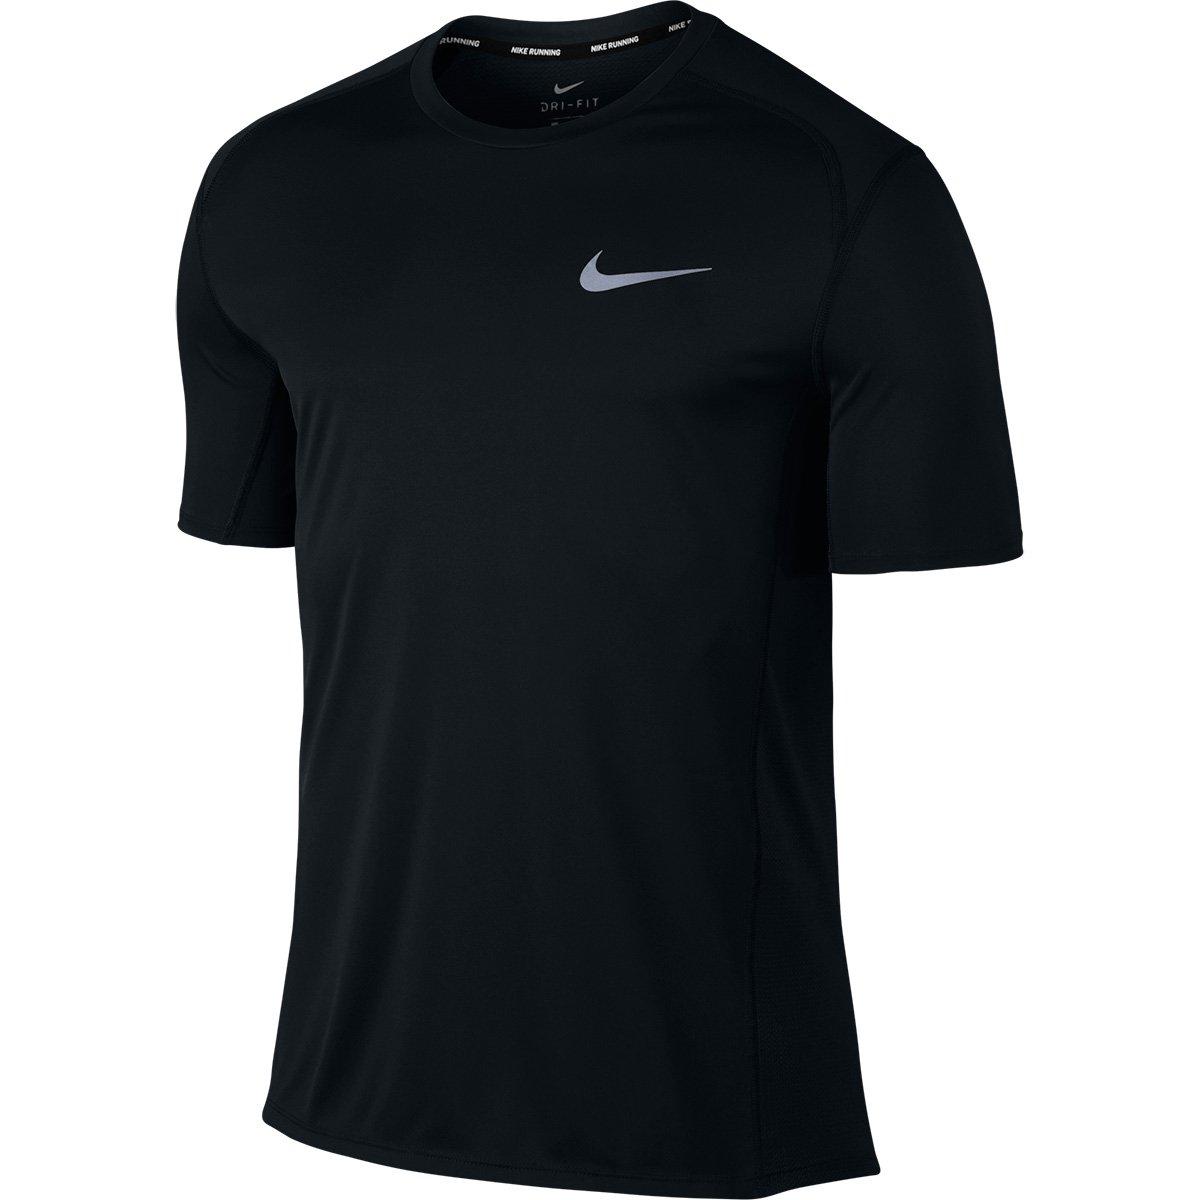 Camiseta Nike Dri-Fit Miler SS Masculina - Preto - Compre Agora ... 120c001115330